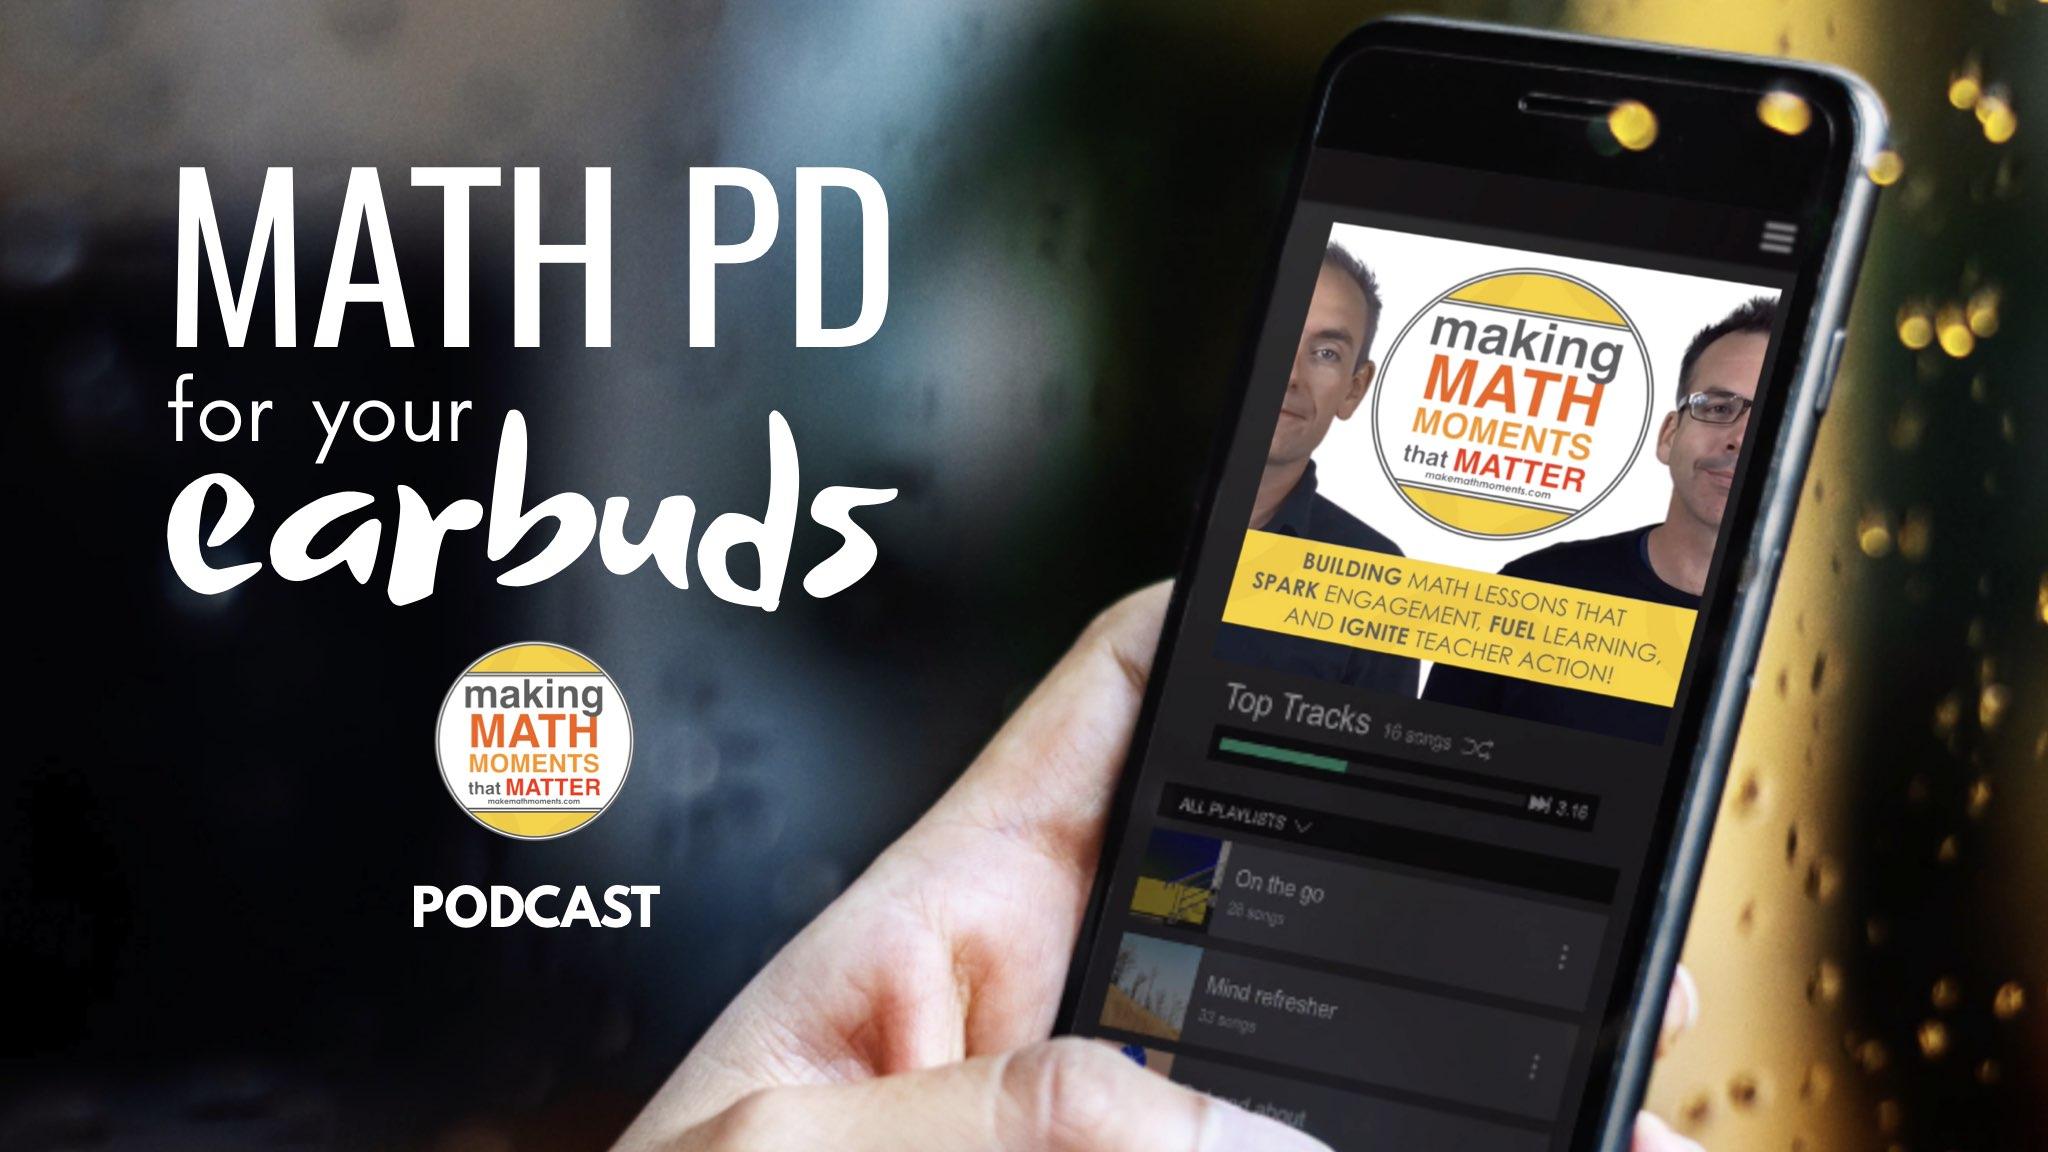 Make Math Moments Podcast